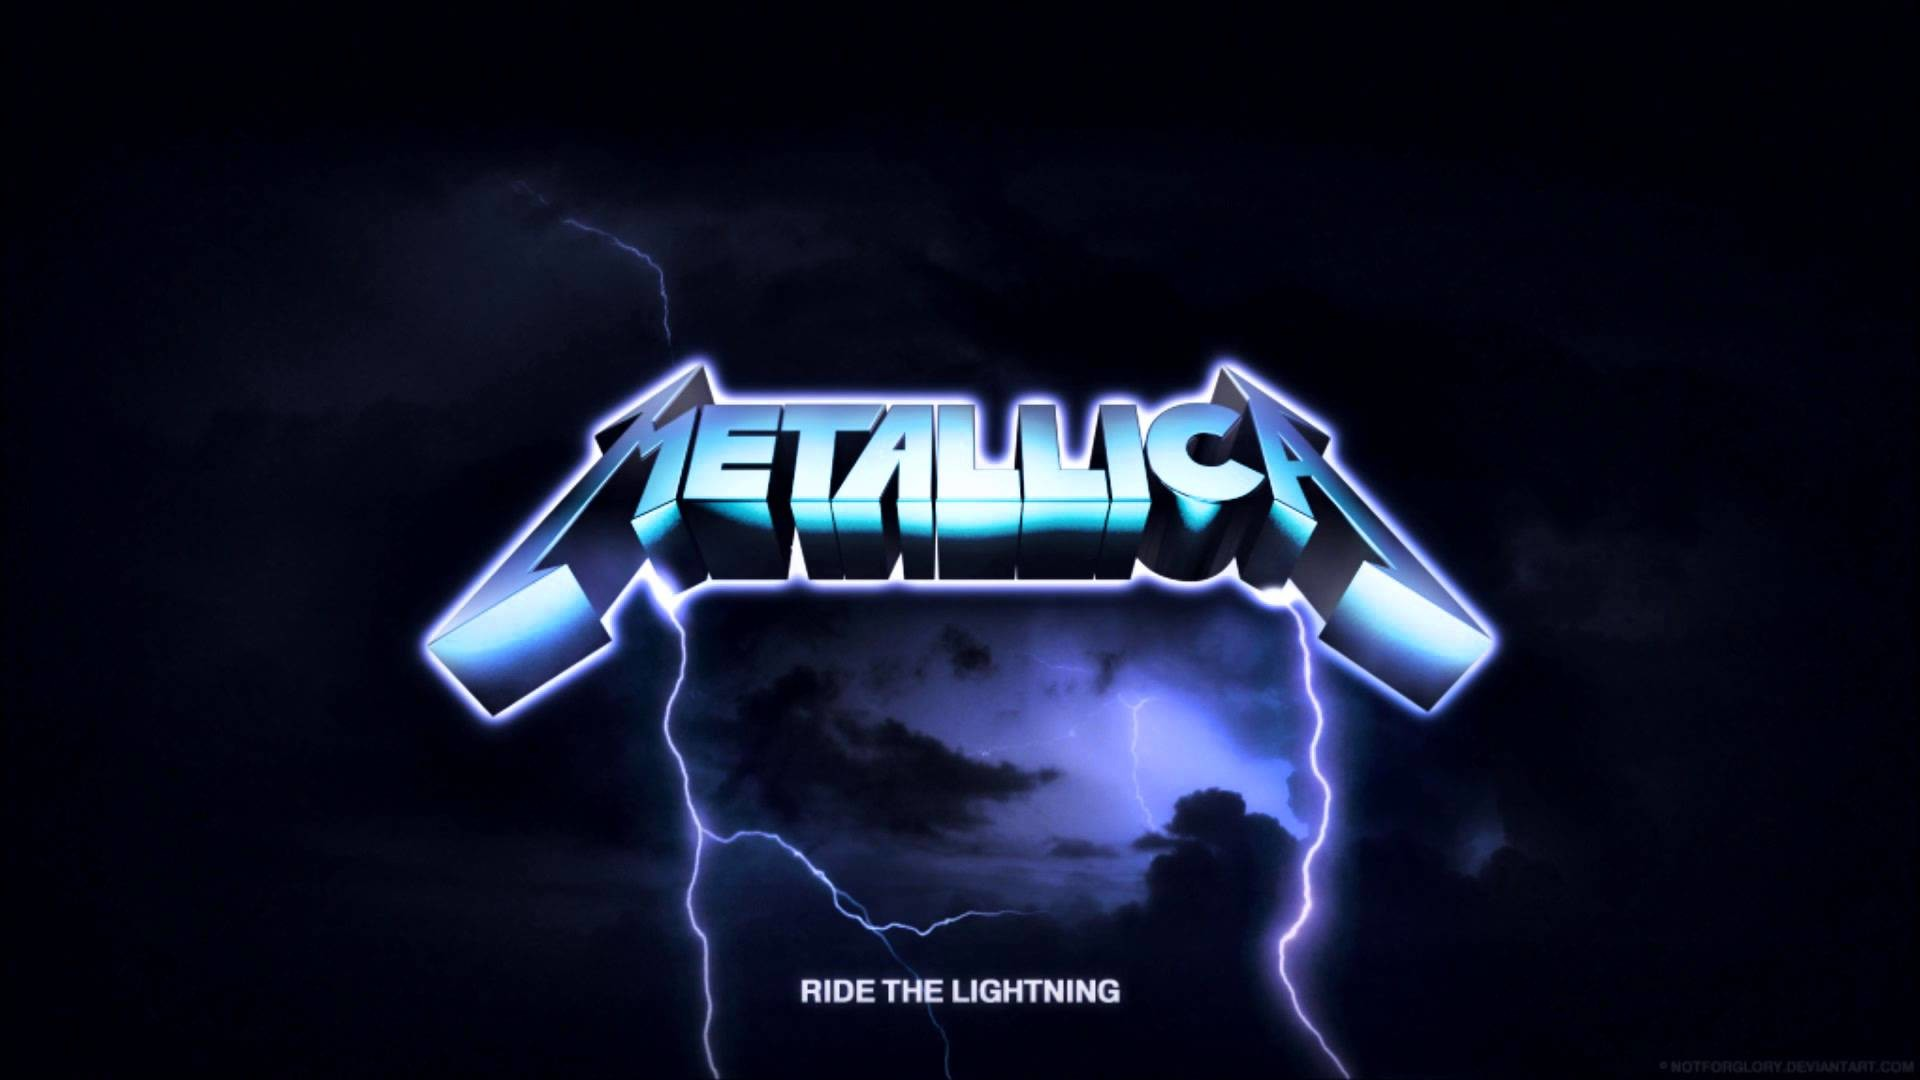 metallica ride the lightning wallpaper 62 images